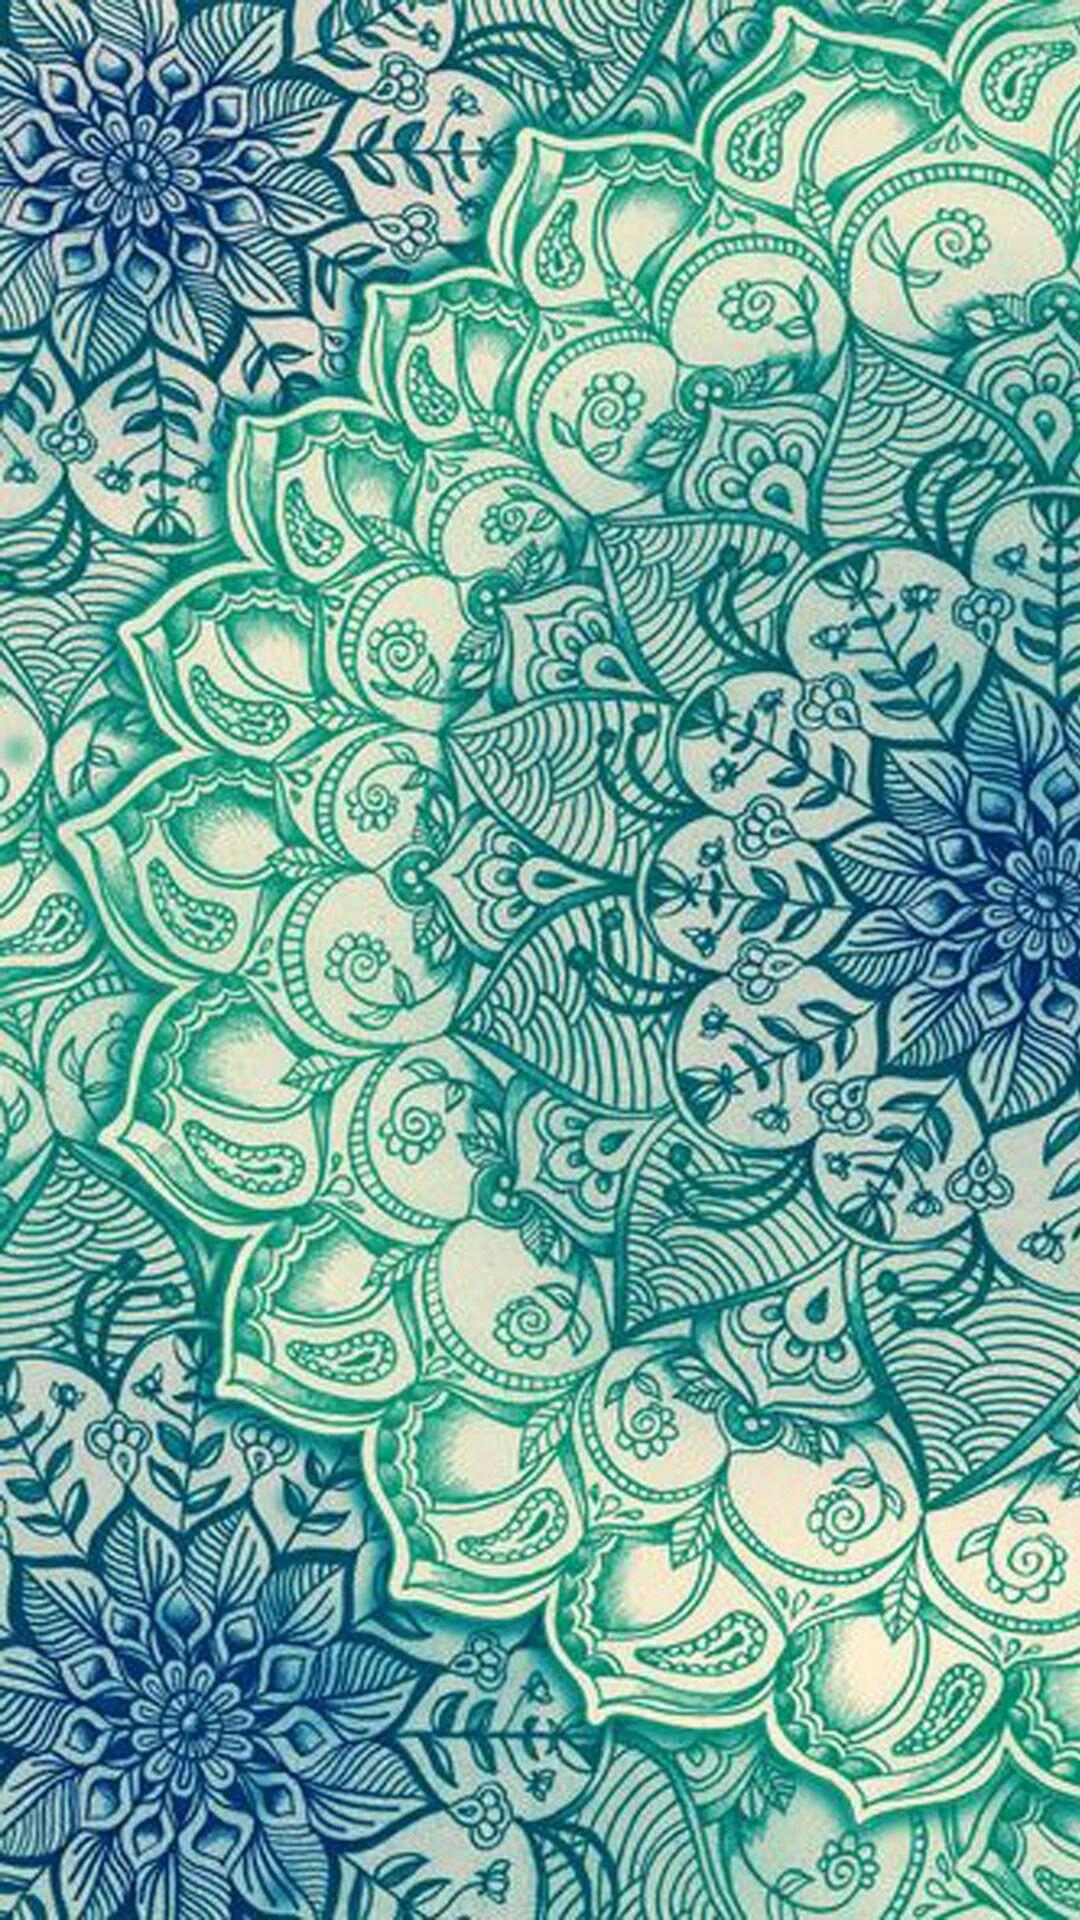 Lilly Pulitzer hd wallpaper